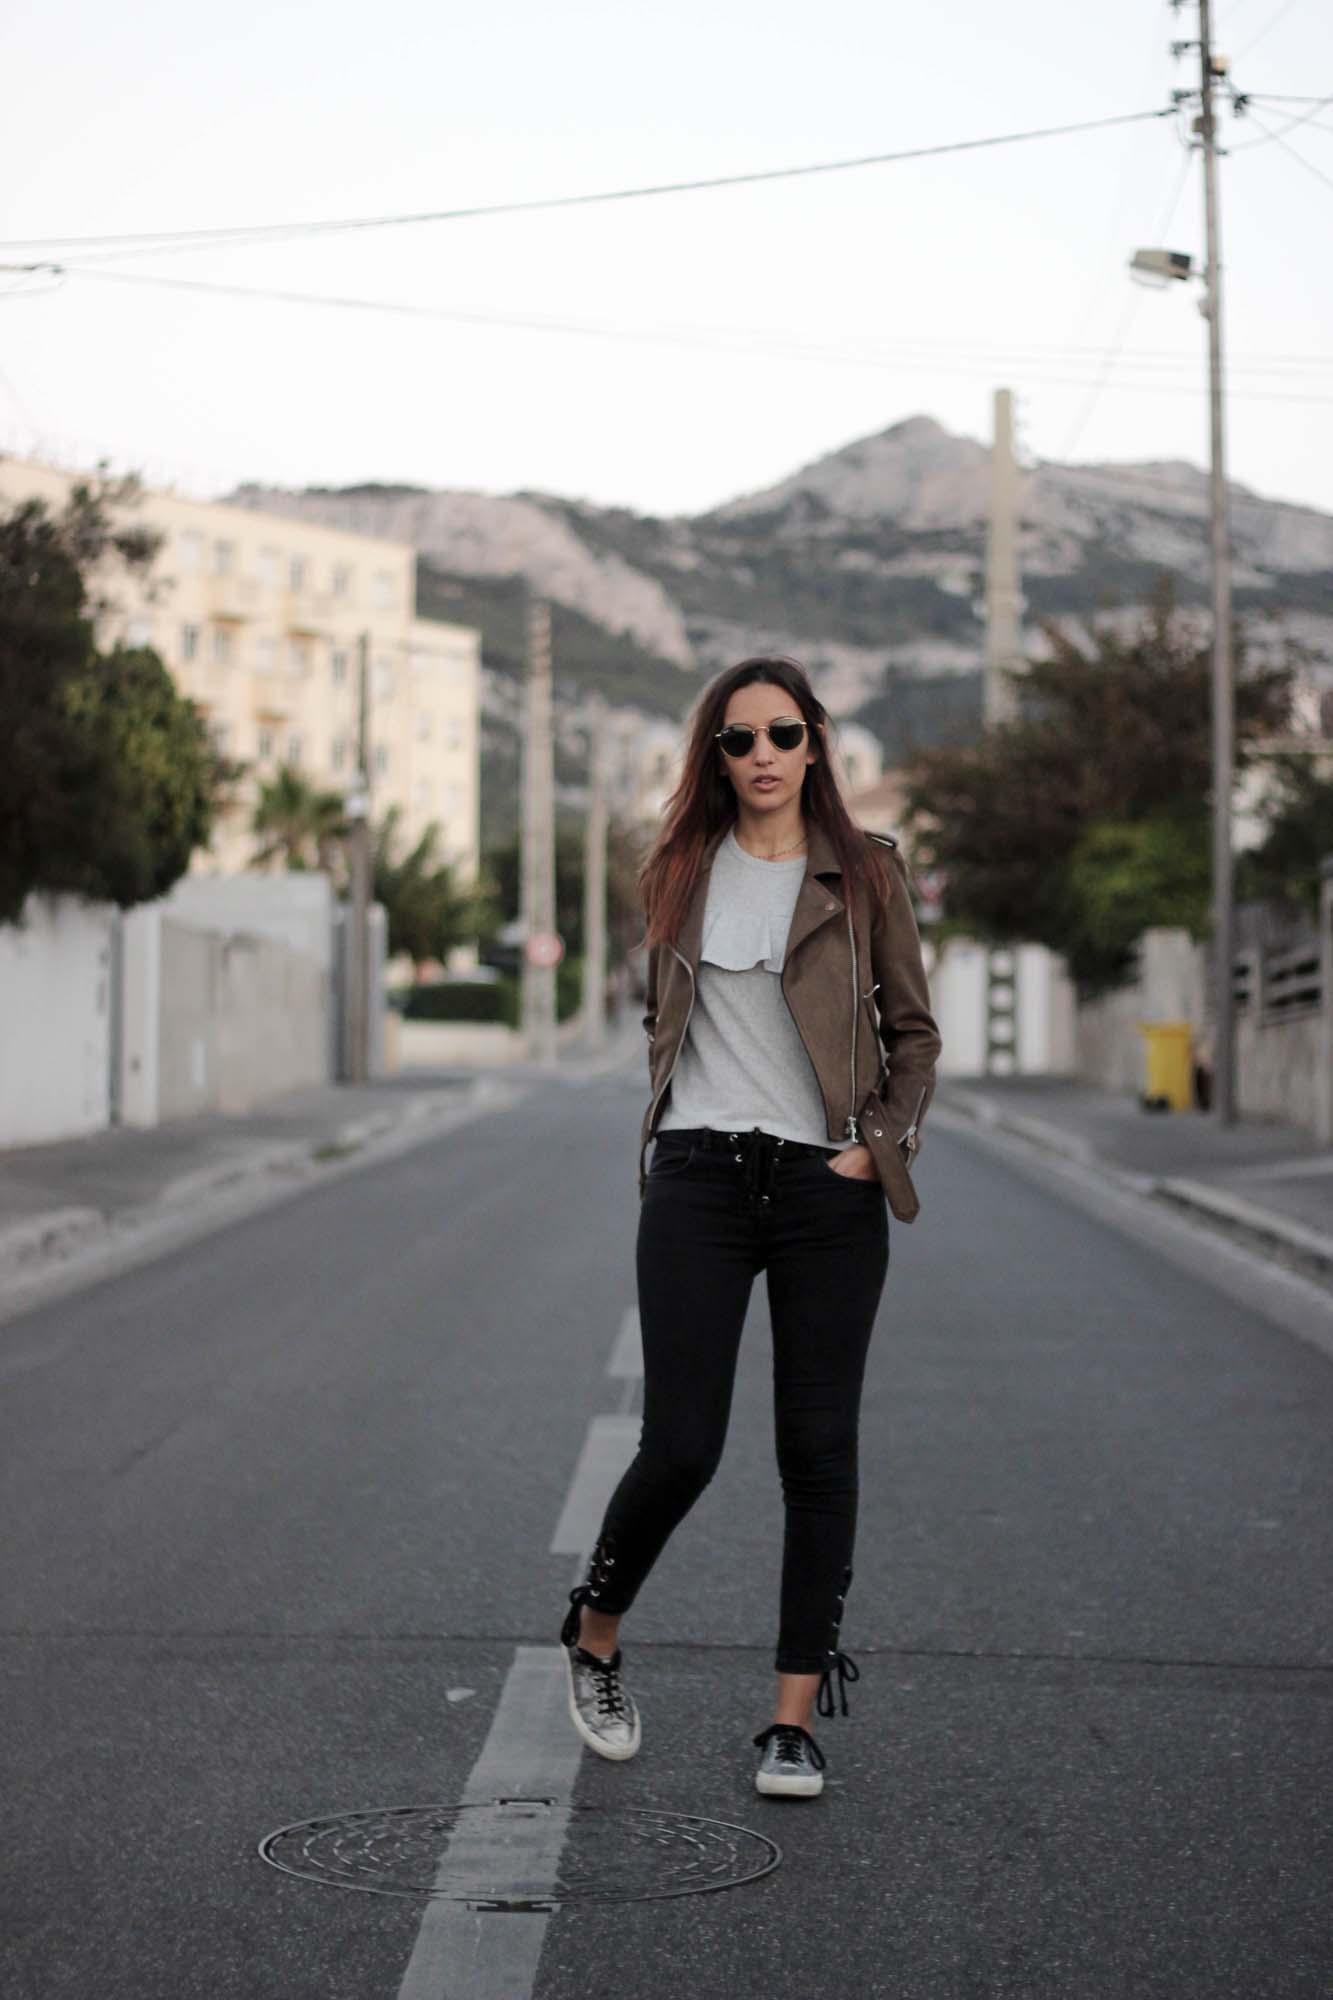 blogueuse-mode-look-perfecto-zara